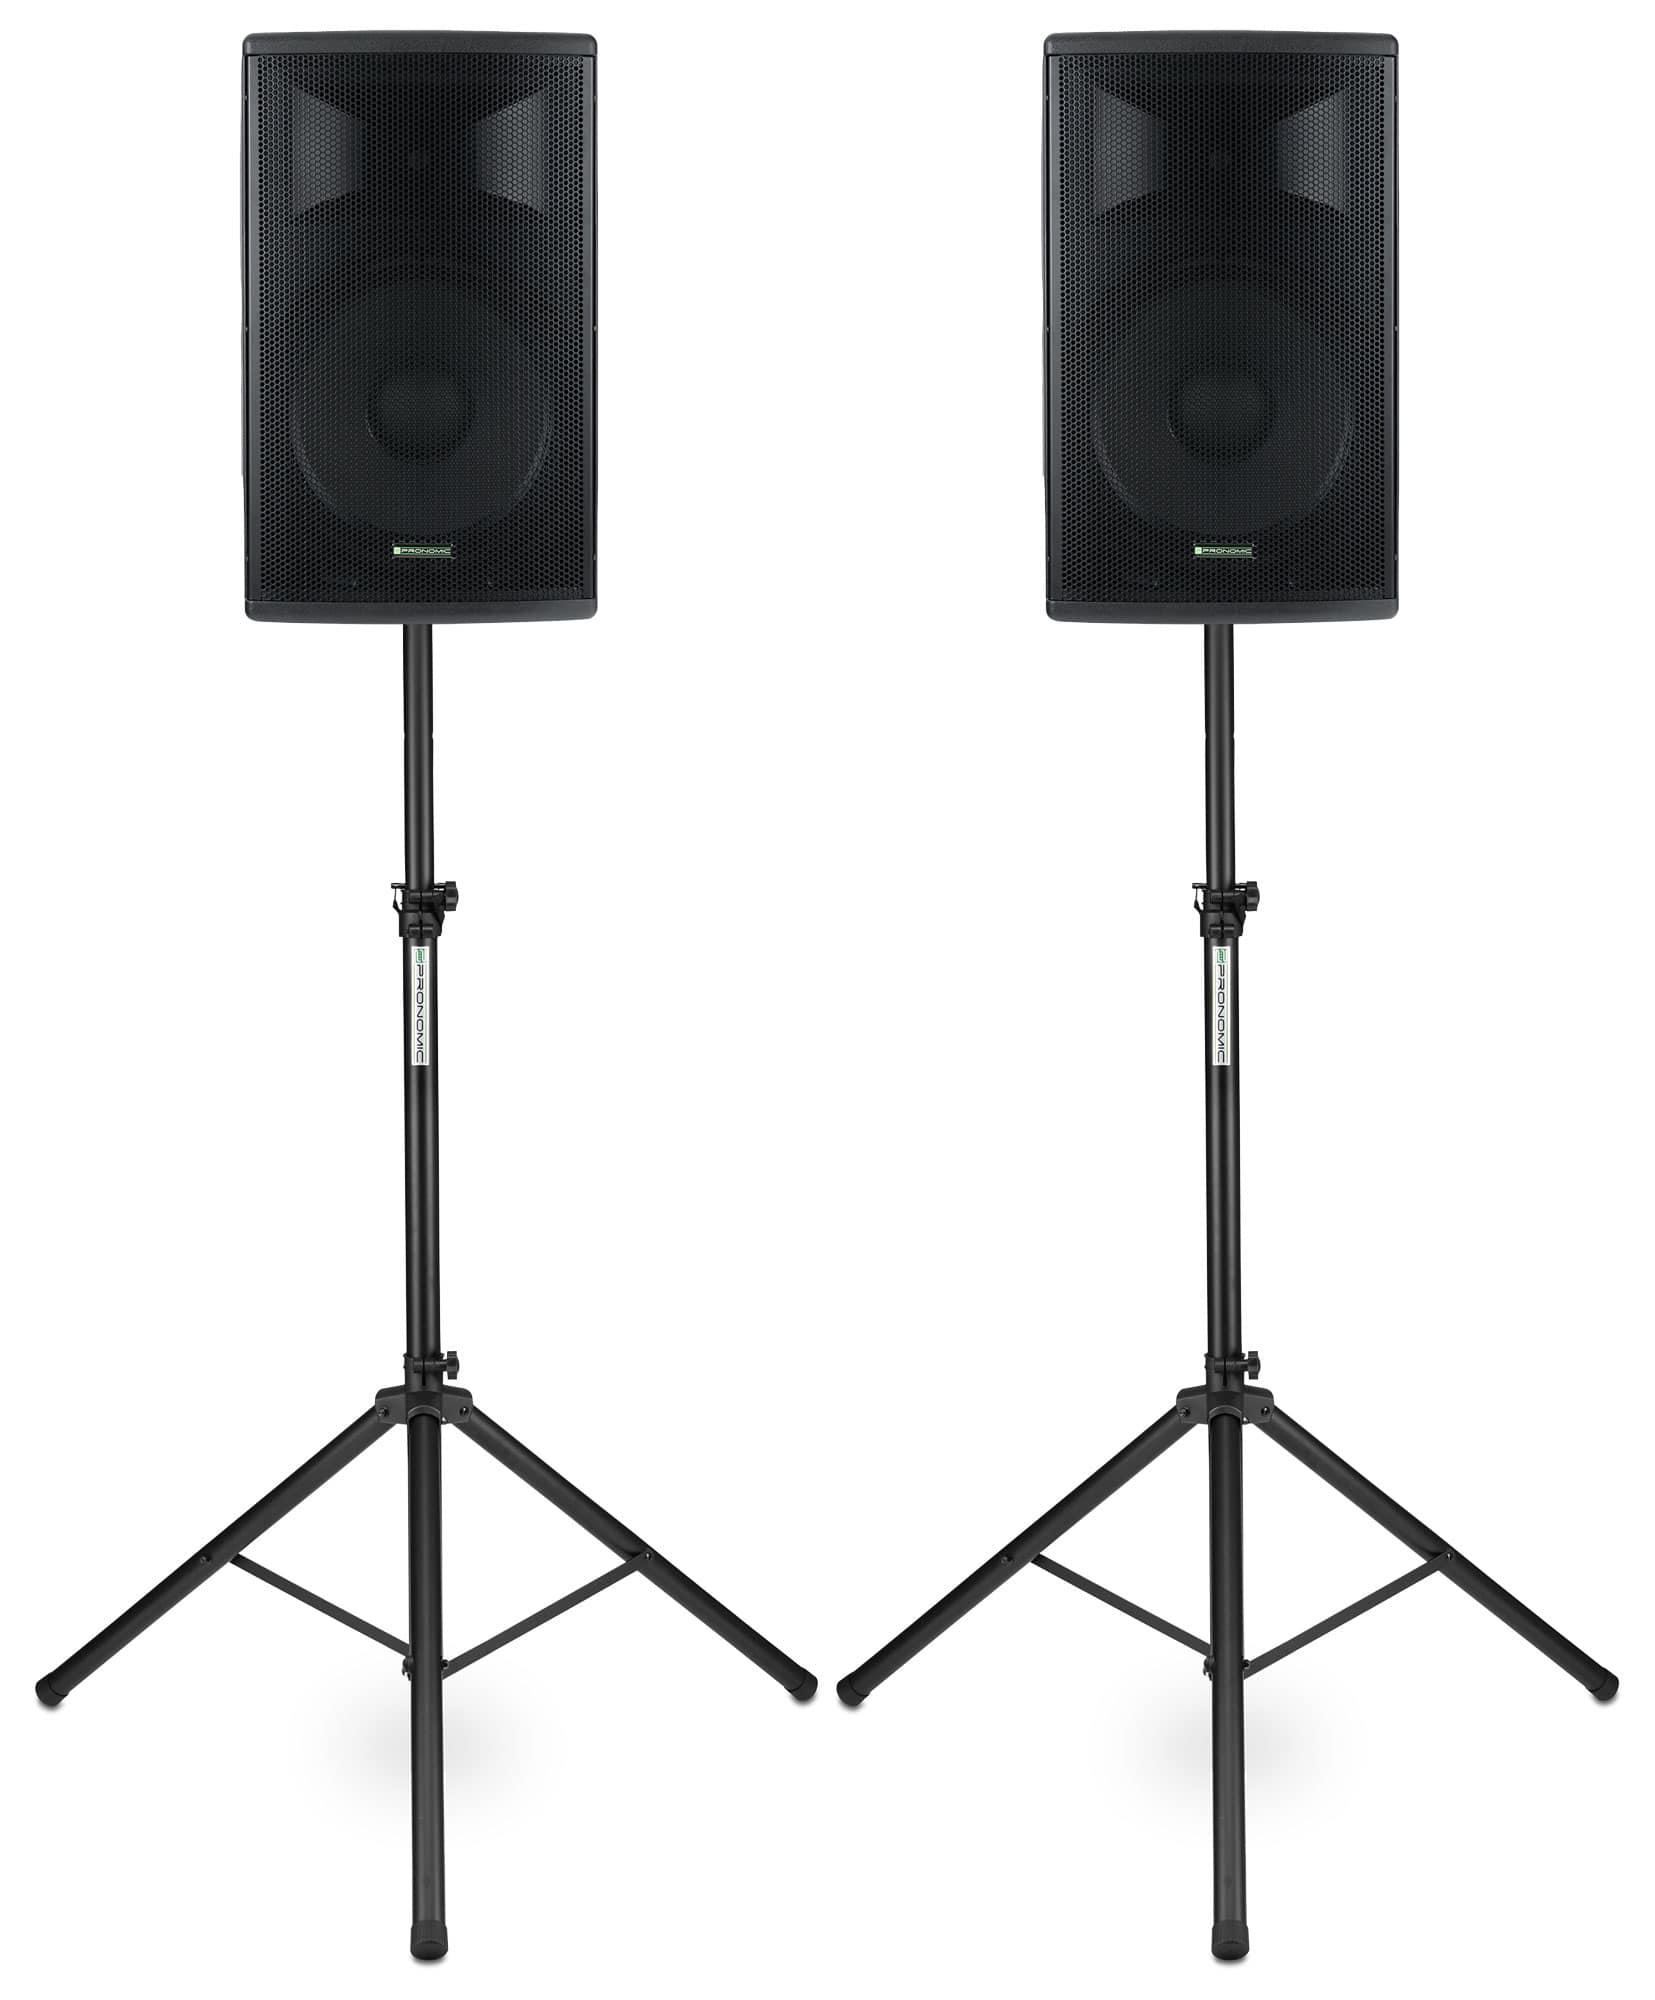 Paboxen - Pronomic E 215 MA 15 Aktivbox 500 Watt Stativ Set - Onlineshop Musikhaus Kirstein